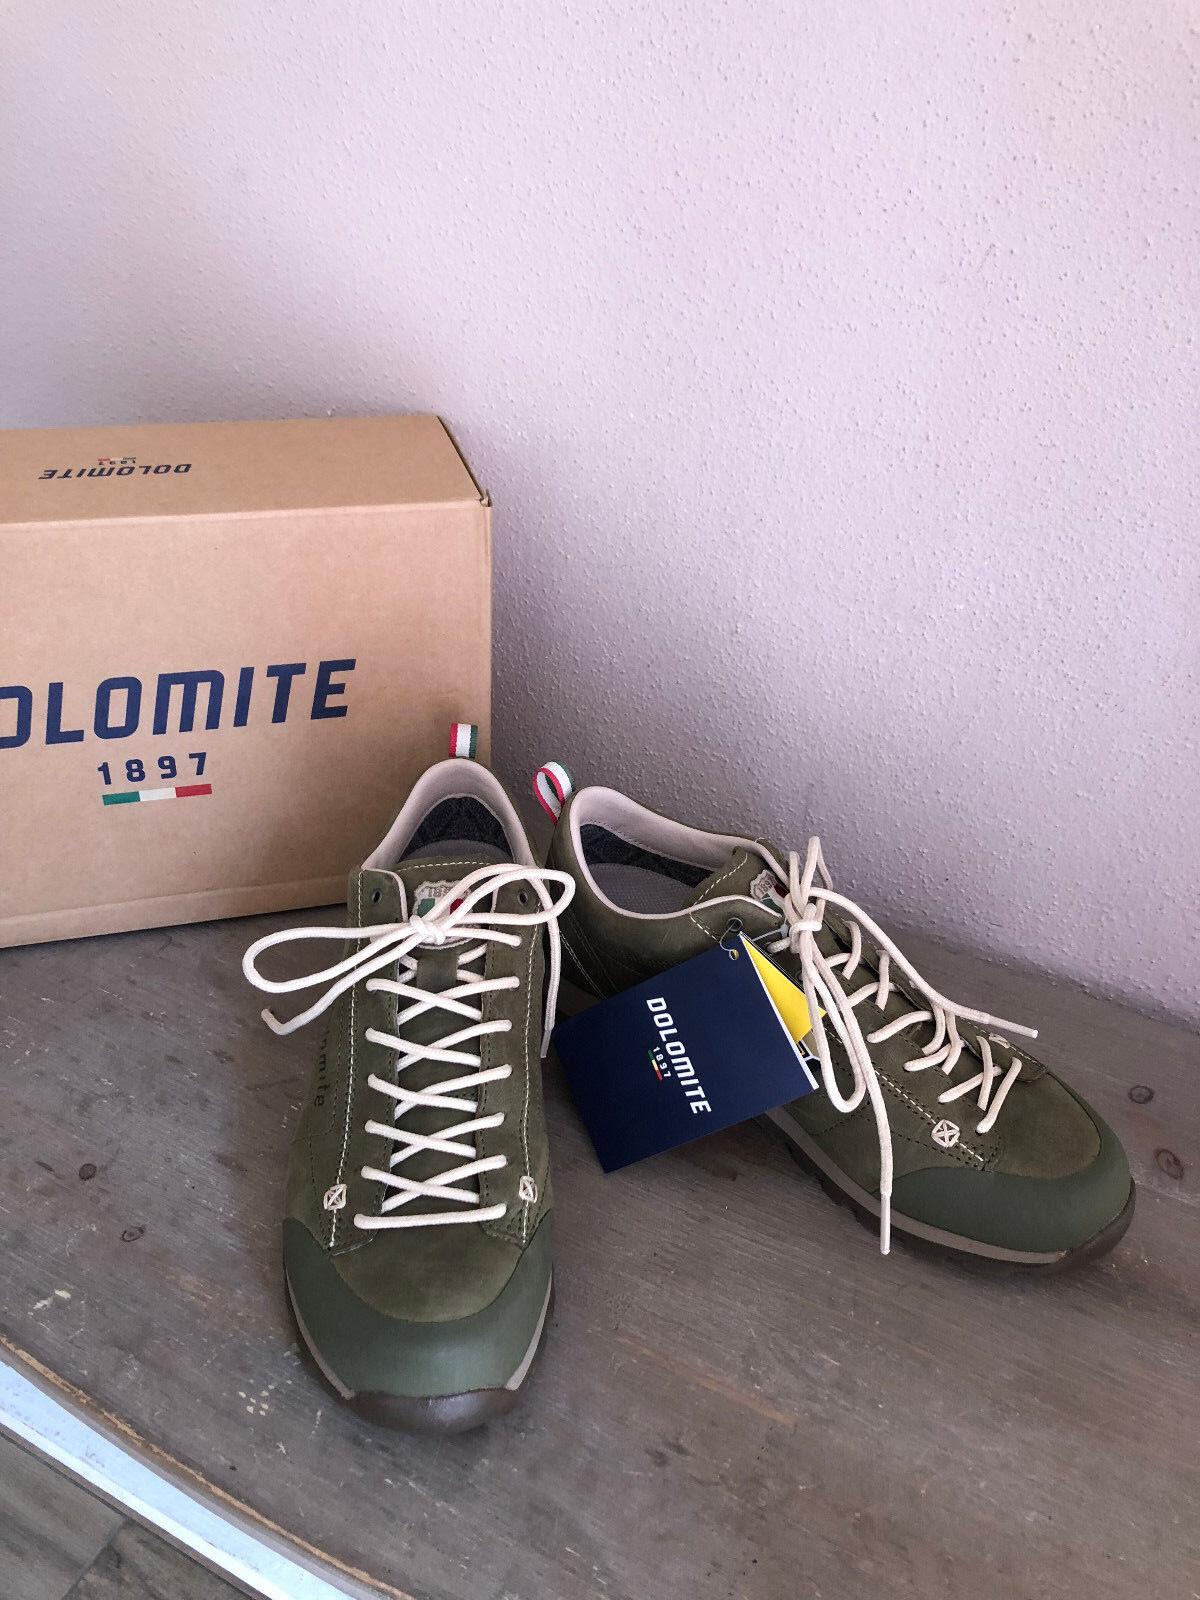 Dolomite cinquantaquattro zapatillas zapato bajo cuero Navy verde 37,5 NP 159,95